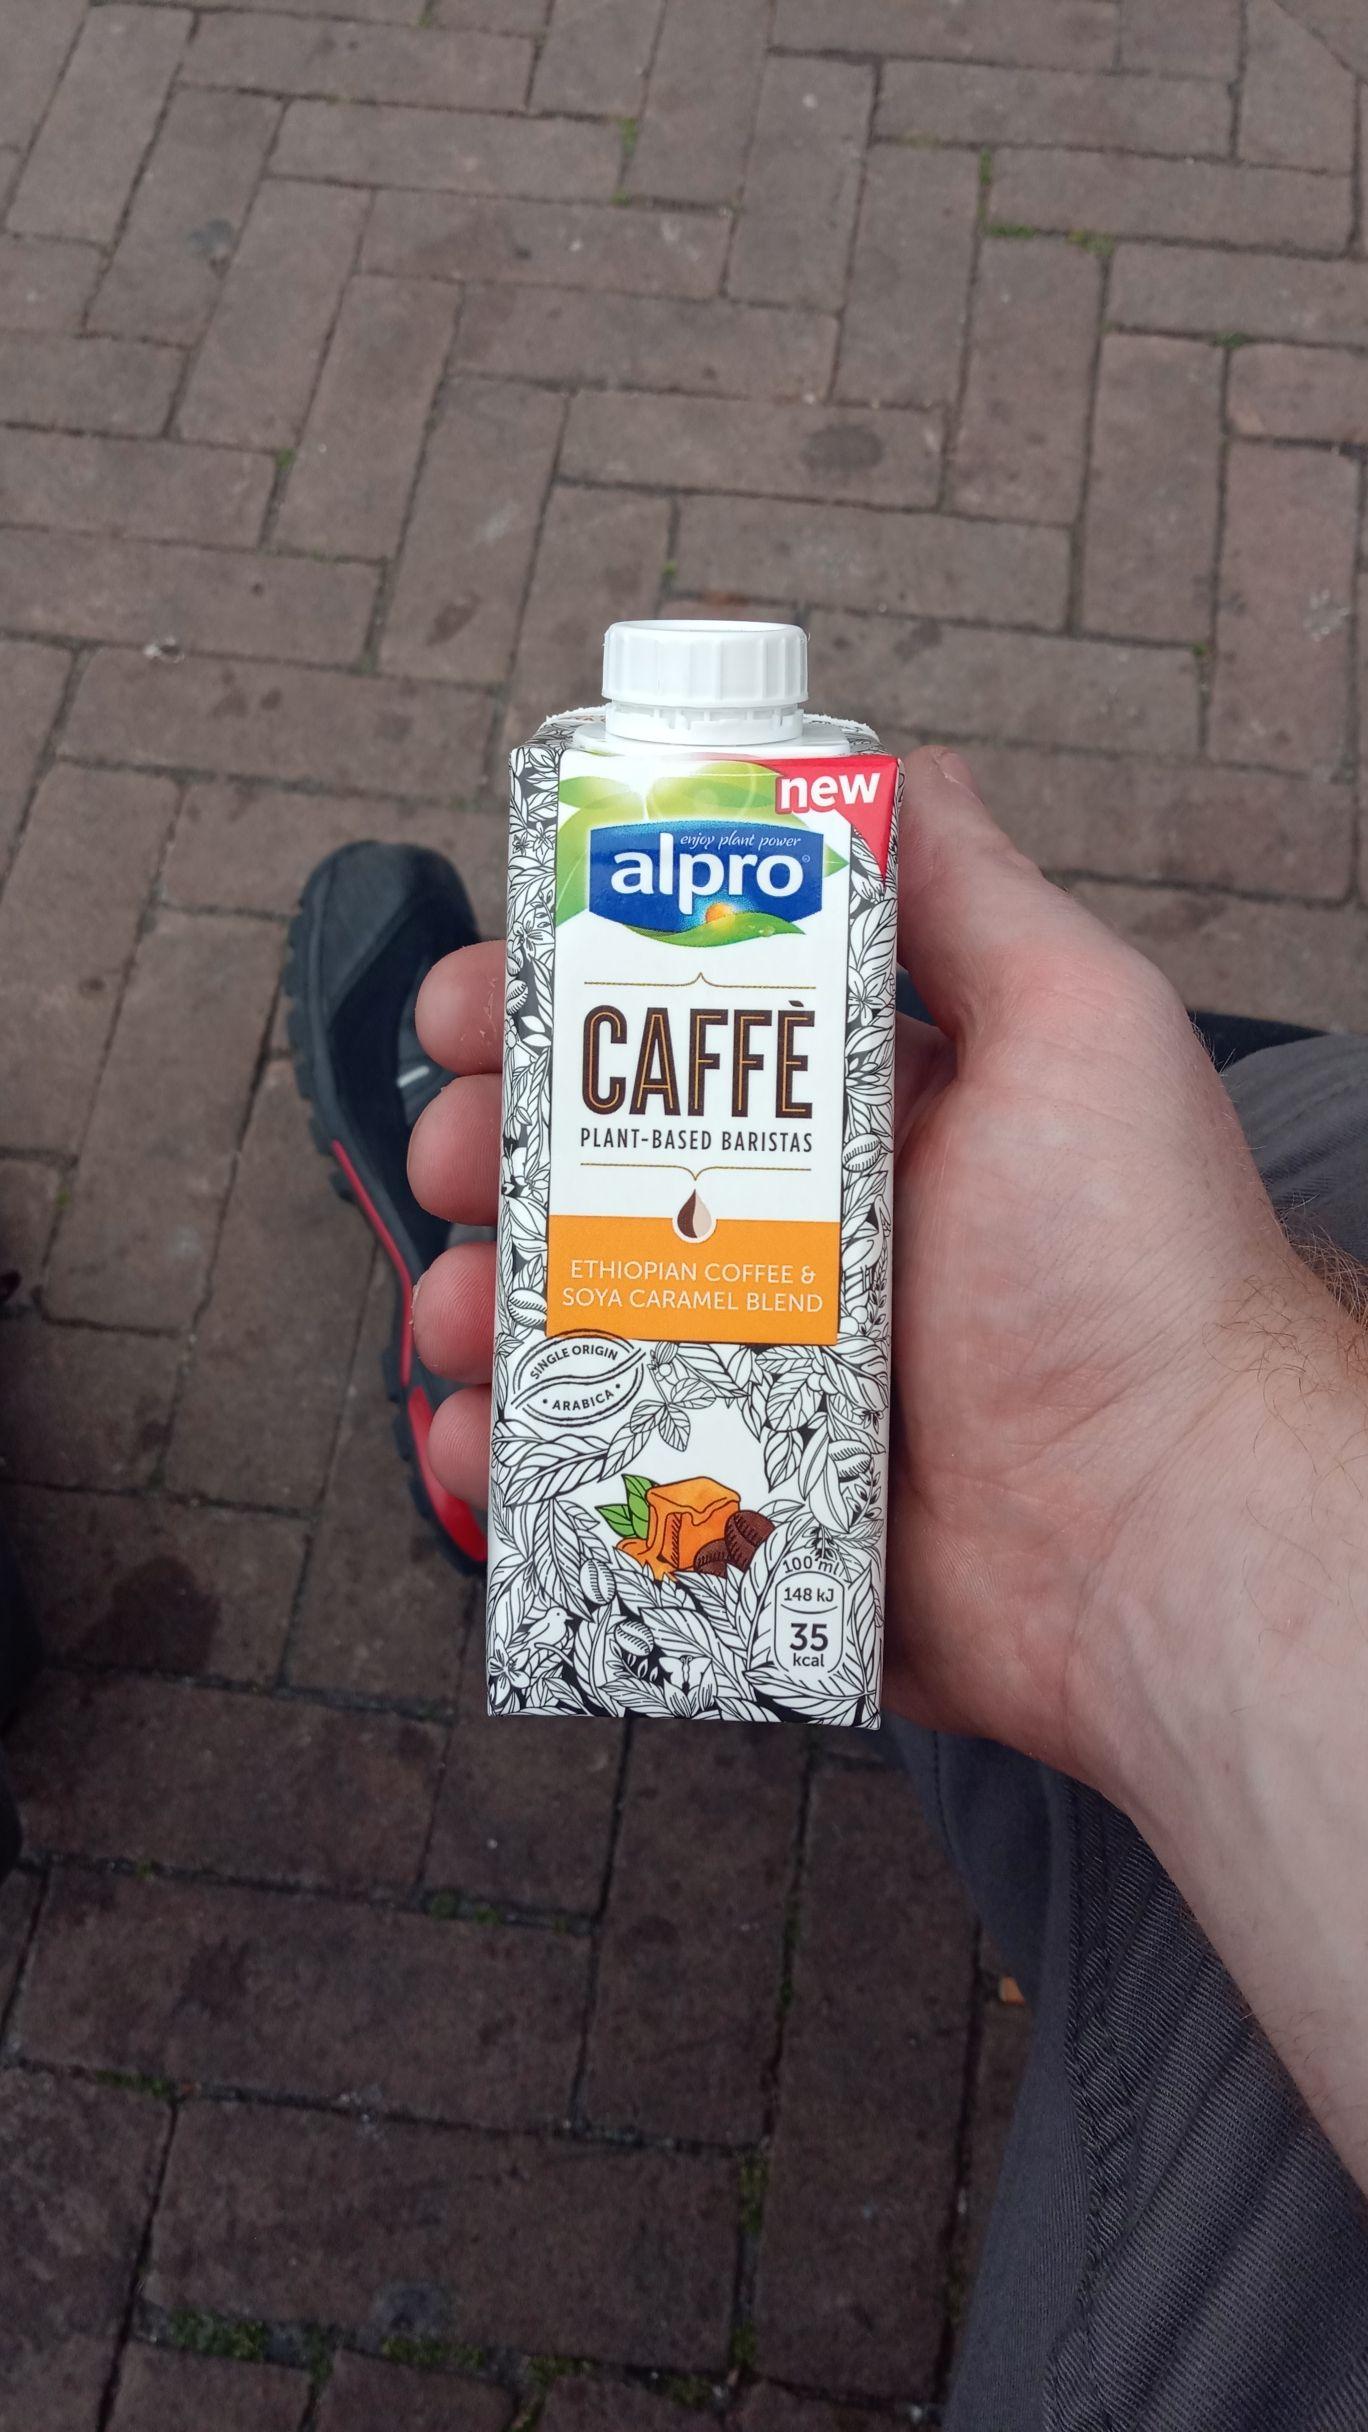 Alpro caffè met caramel (lokaal ah) gratis